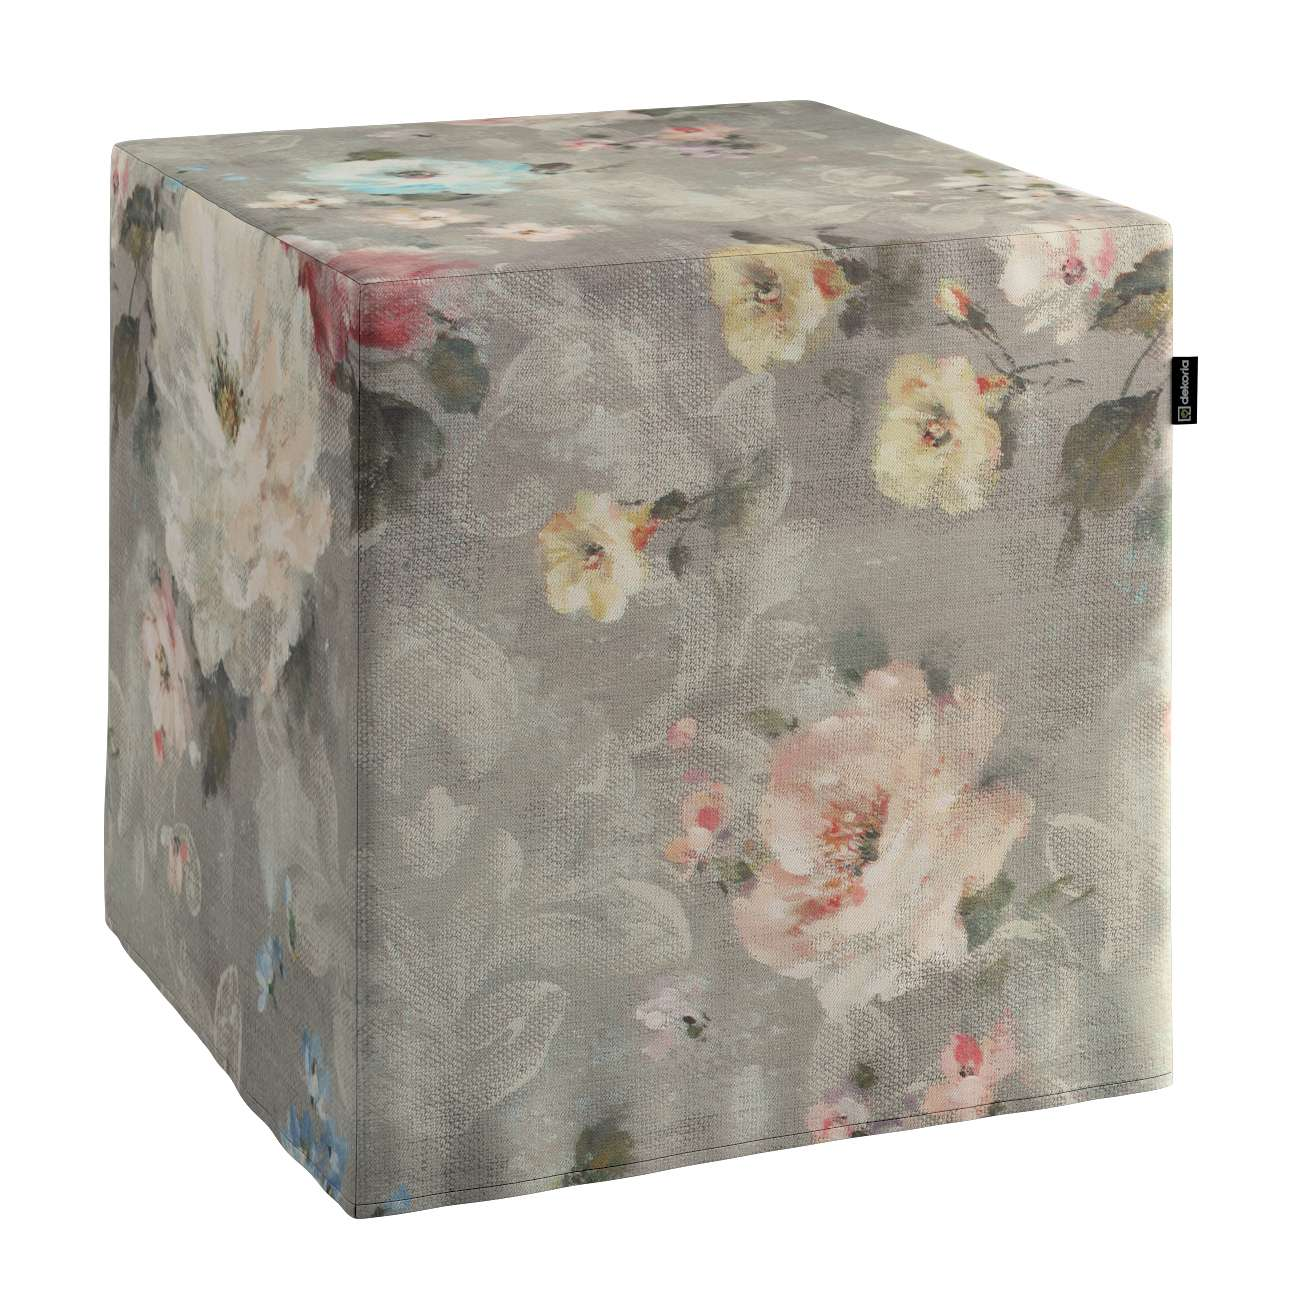 Siddepuf 40 x 40 x 40 cm fra kollektionen Monet, Stof: 137-81